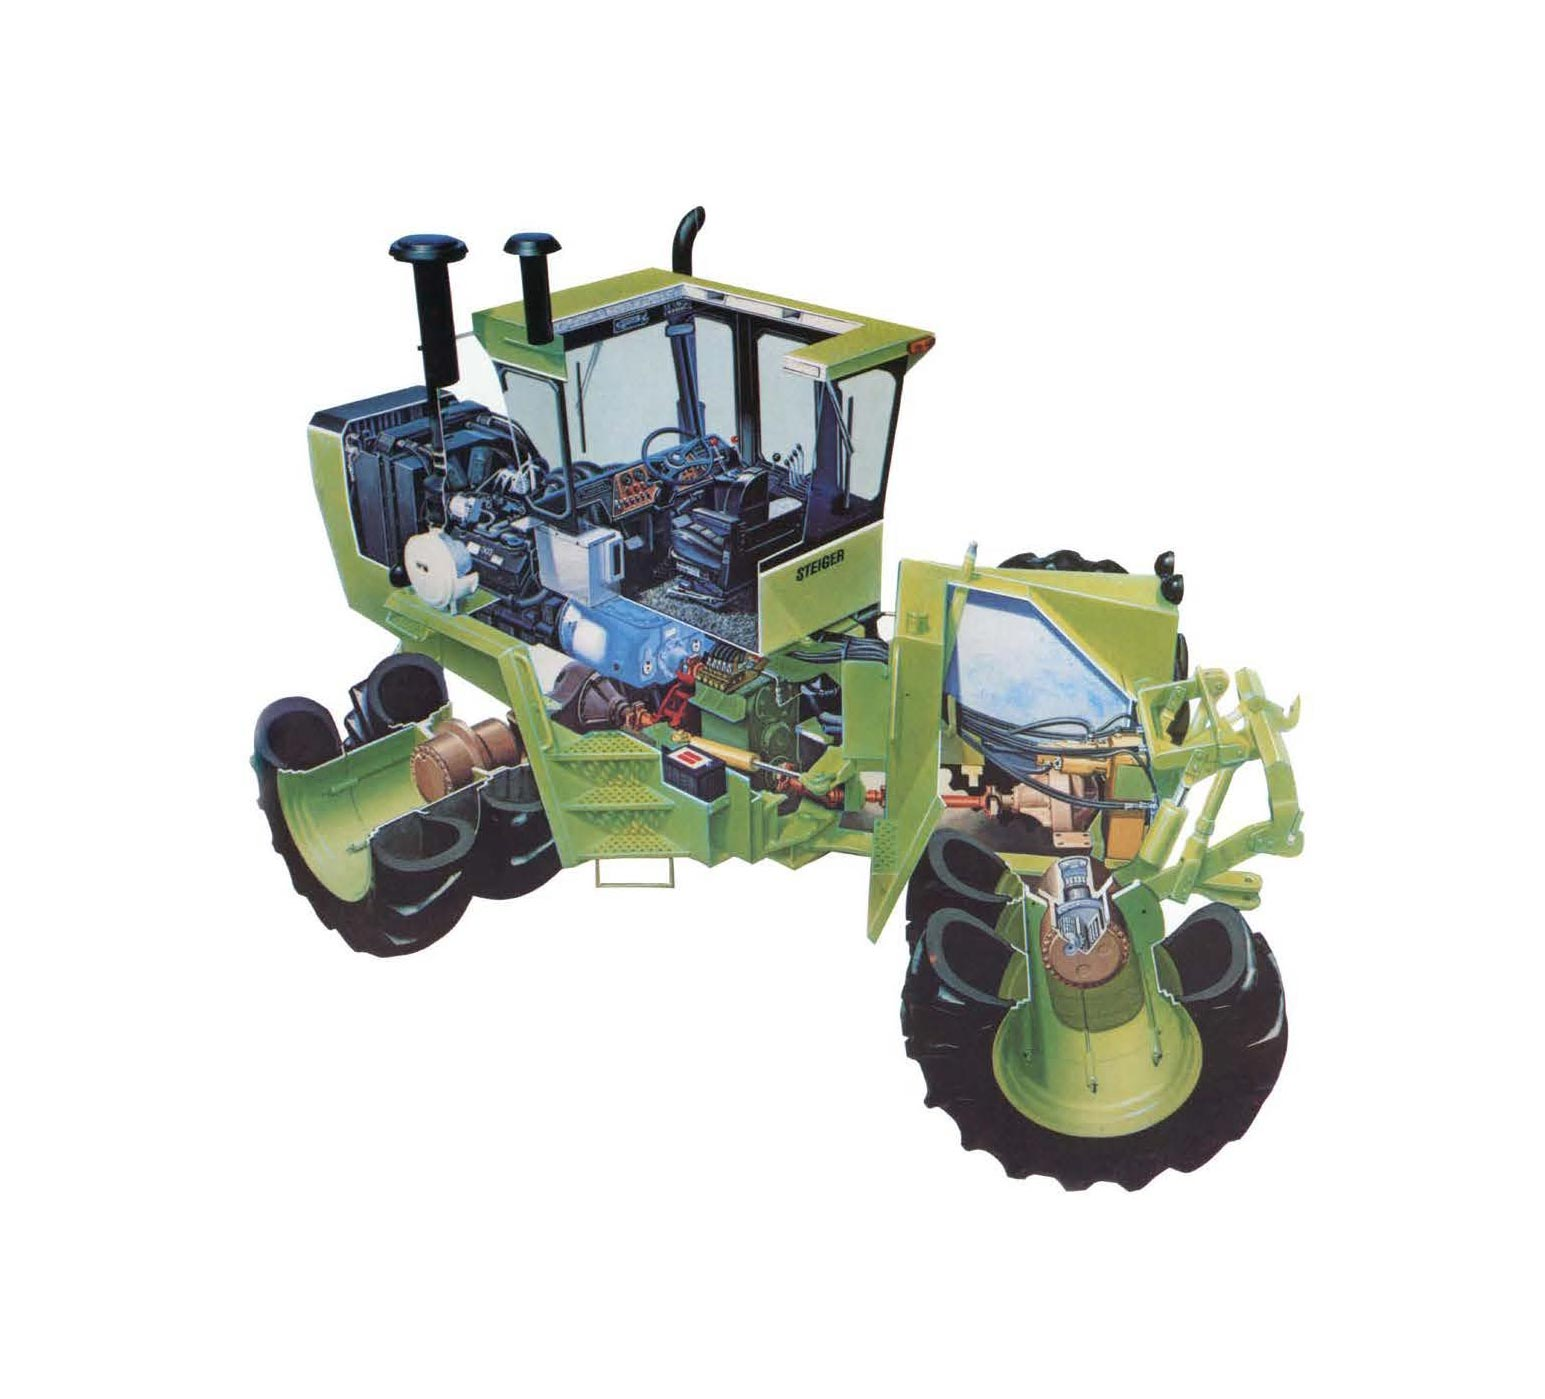 Steiger PT tractor cutaway